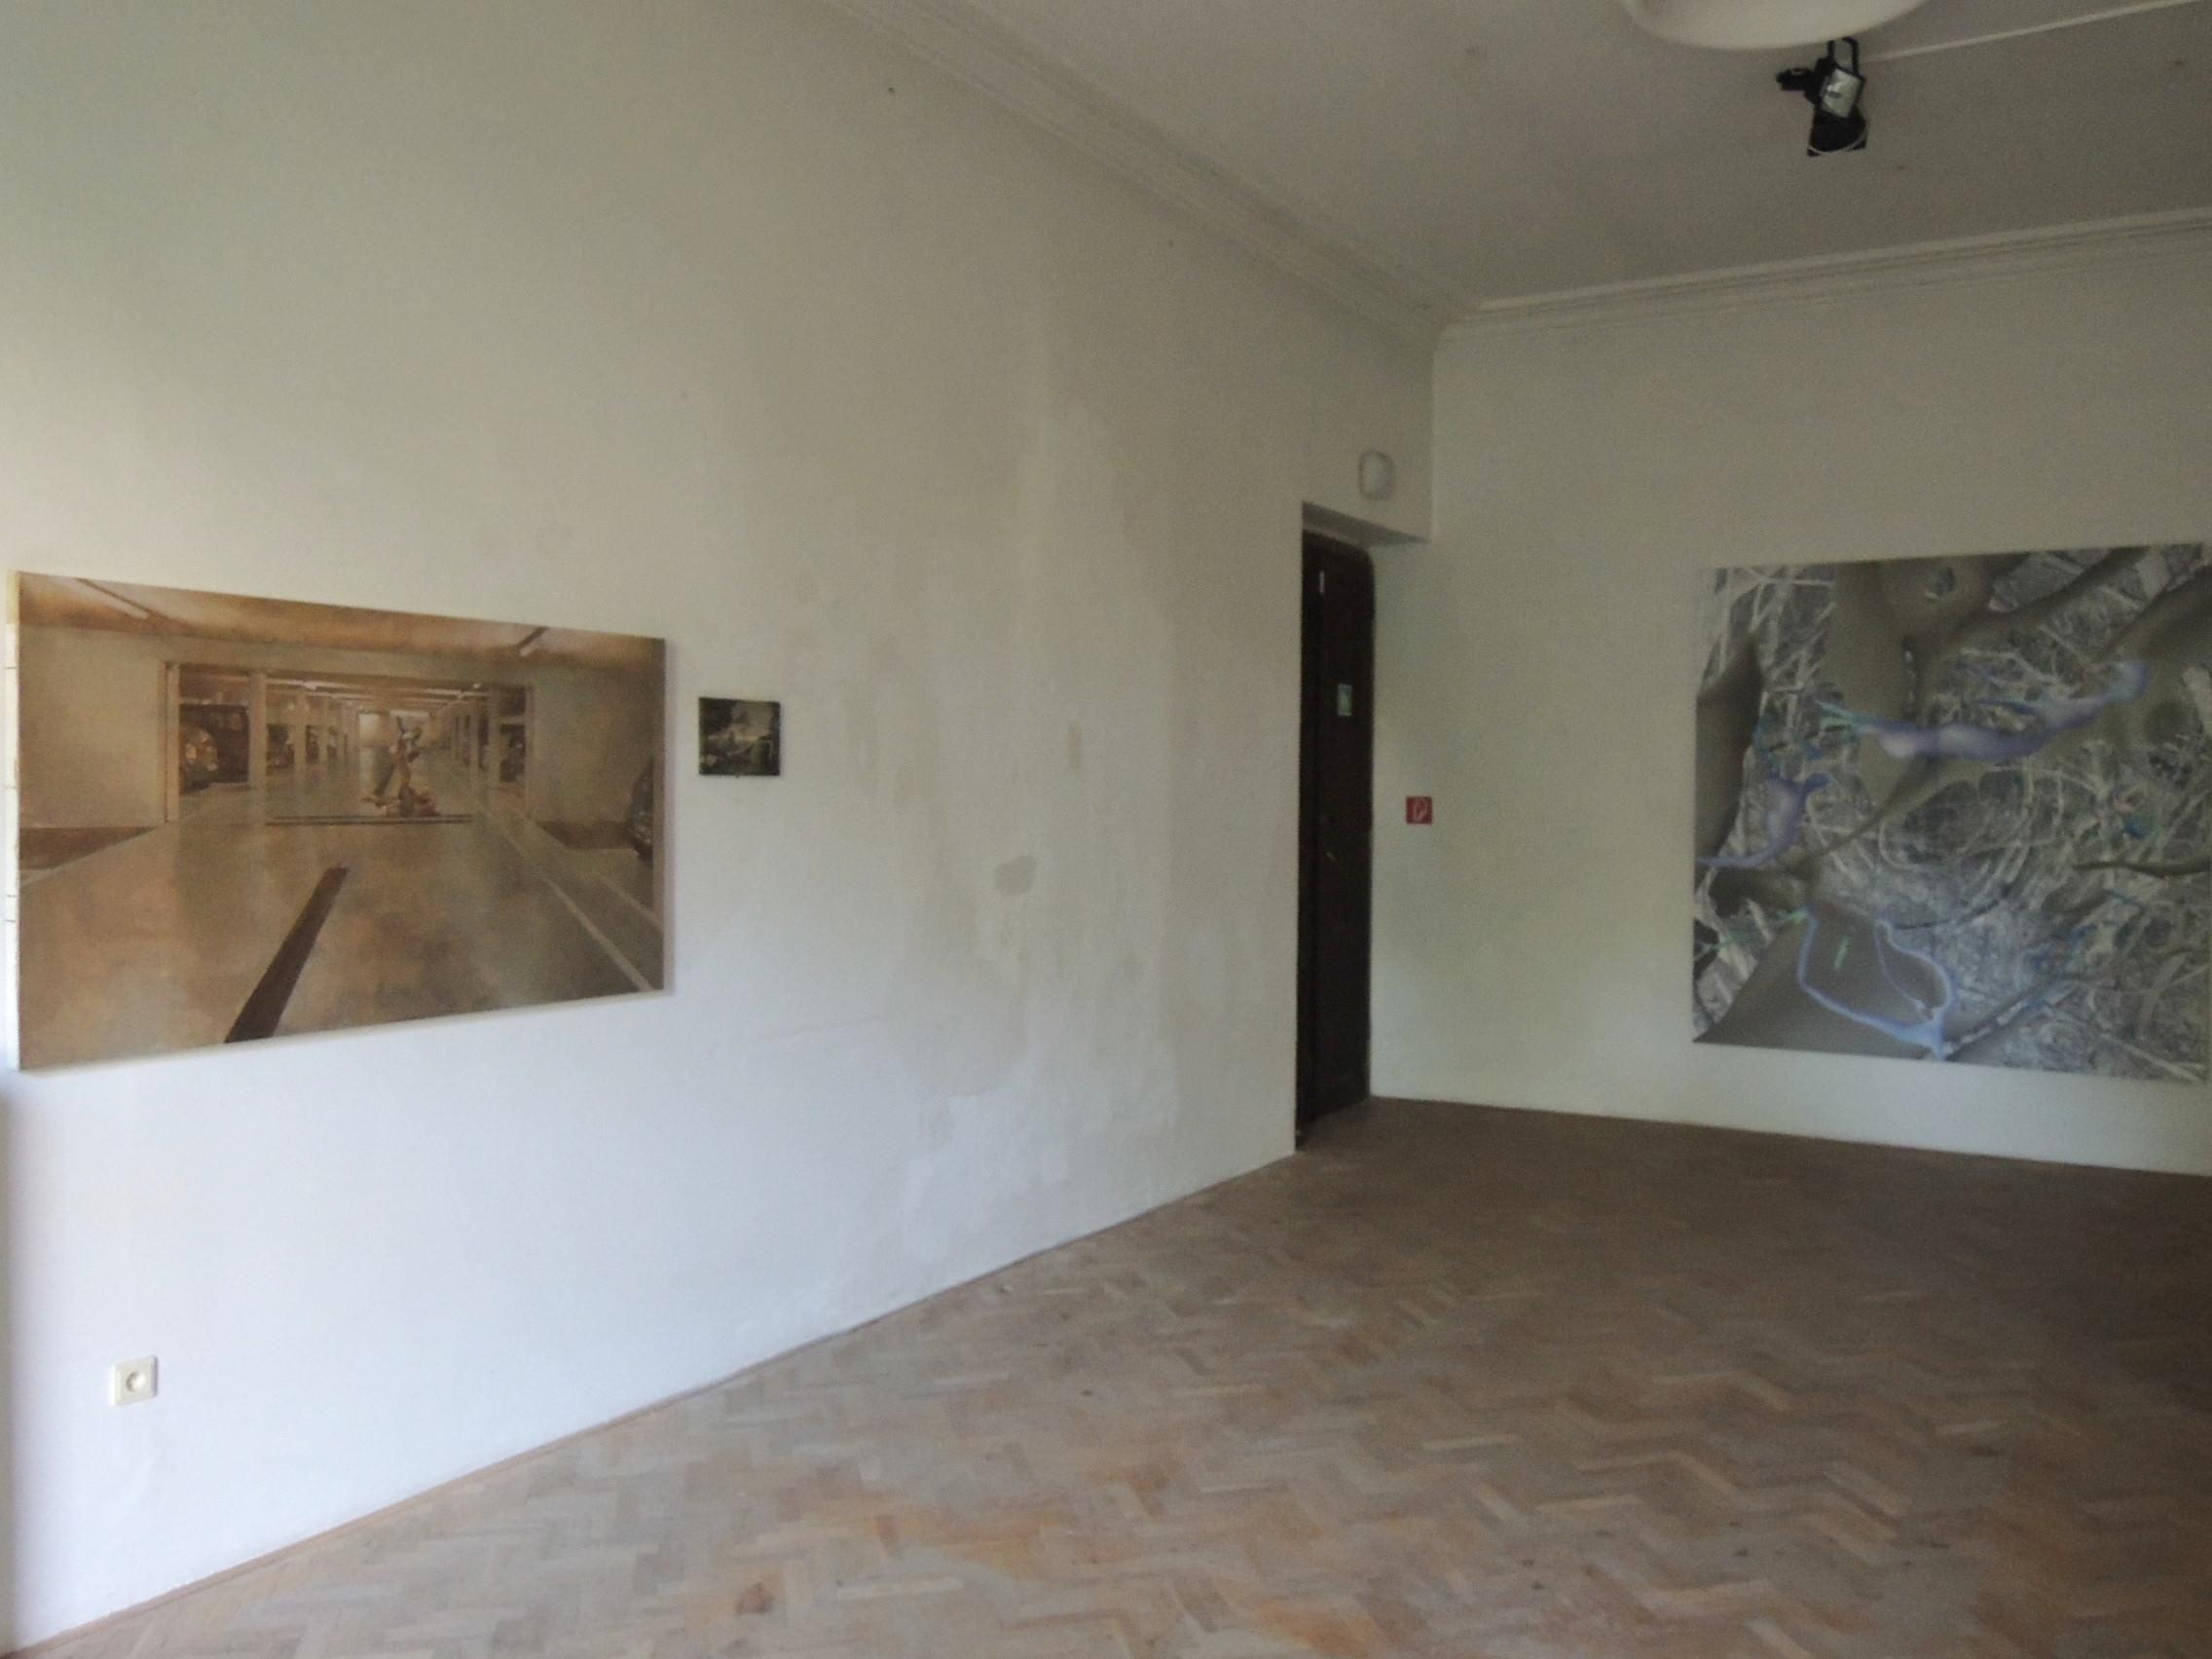 La Belle Peinture 2 , Bratislava (SK), Pisztory Palace.Curators : Eva Hober and Ivan Jançar. Guillaume Bresson,